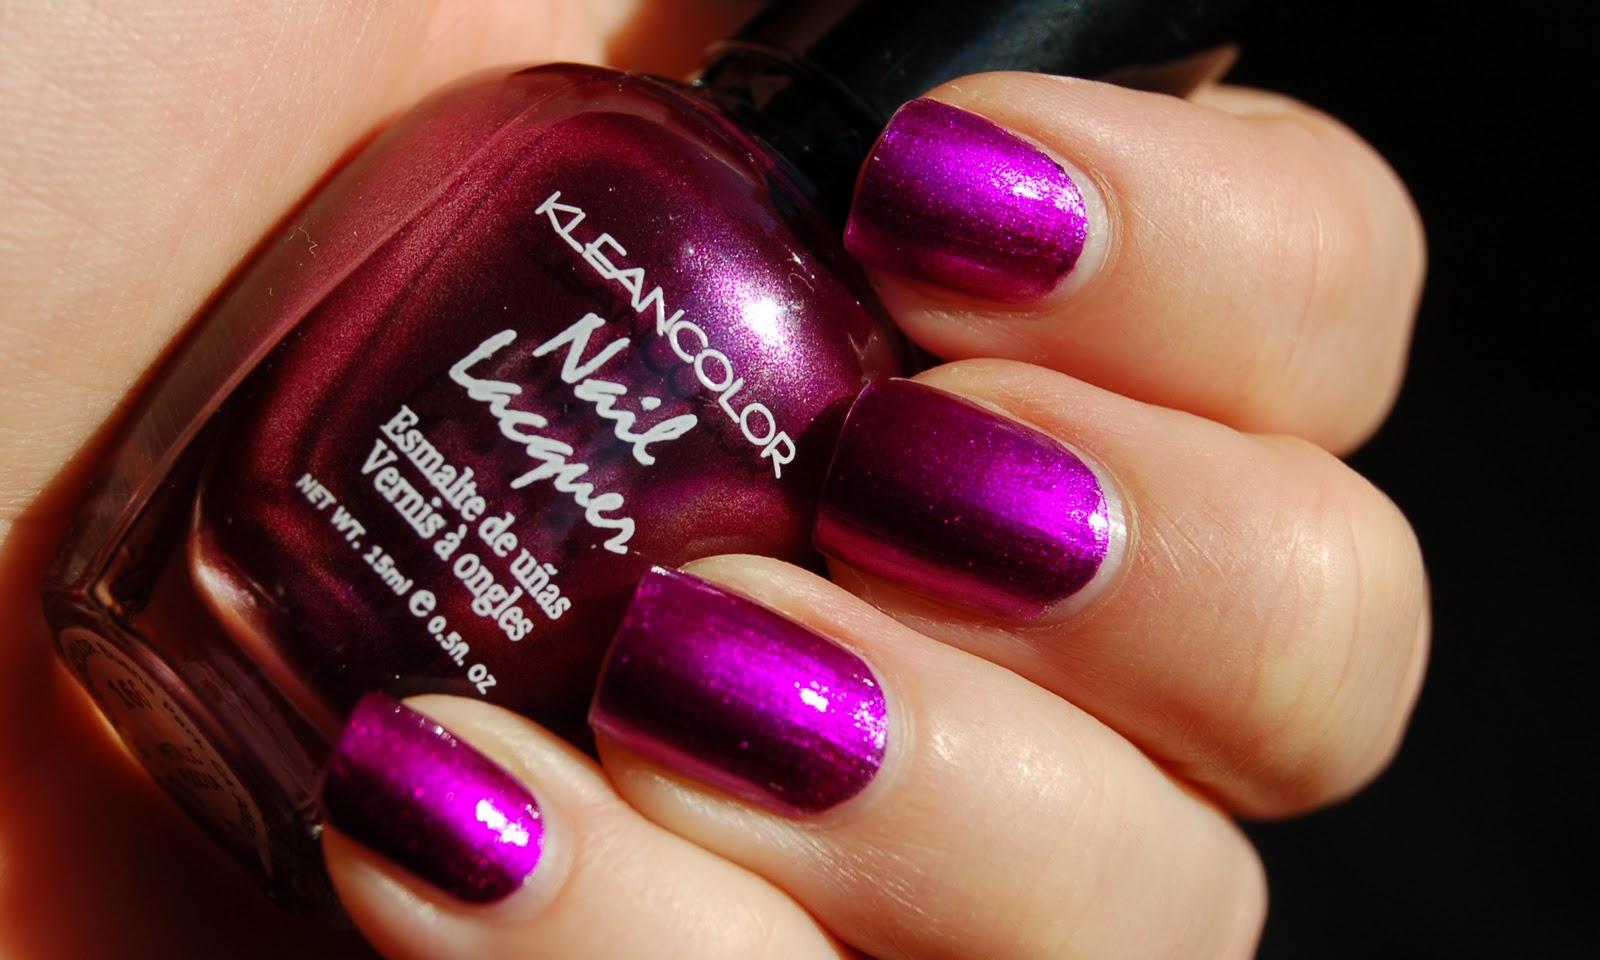 Nails by Noir: Kleancolor Metallic Fuschia